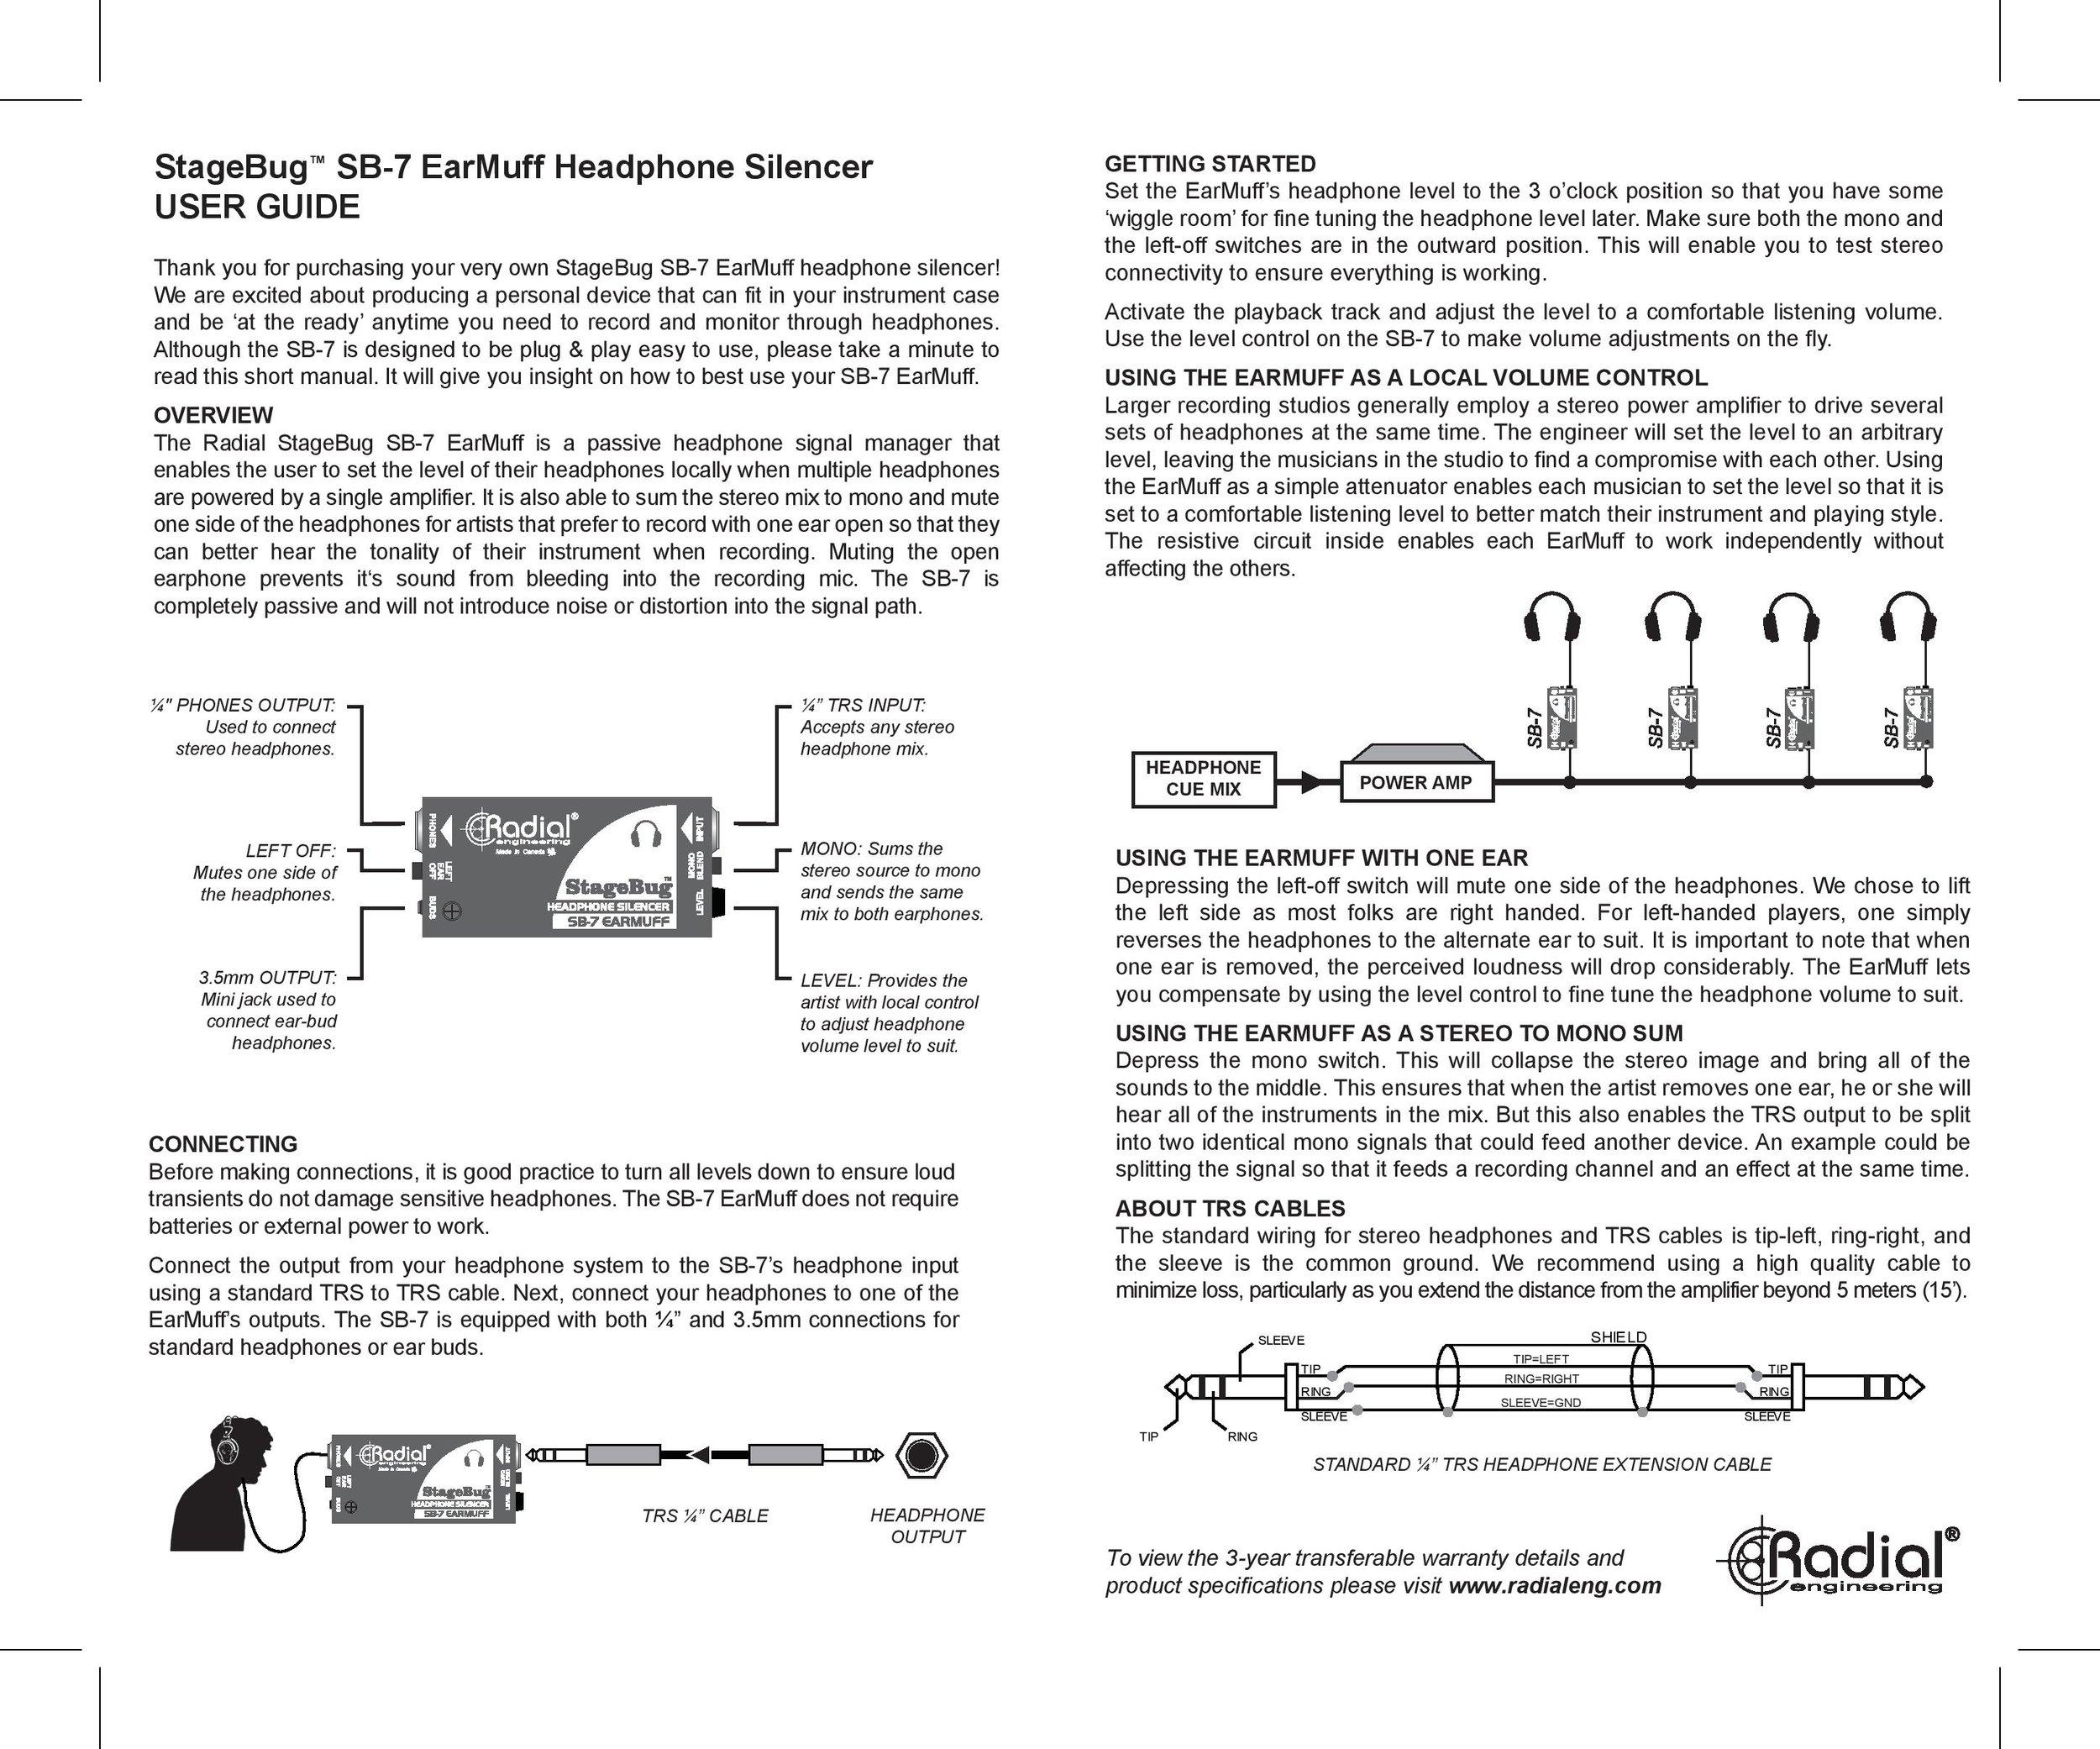 StageBug-SB-7-EarMuff-user-guide-page-001.jpg